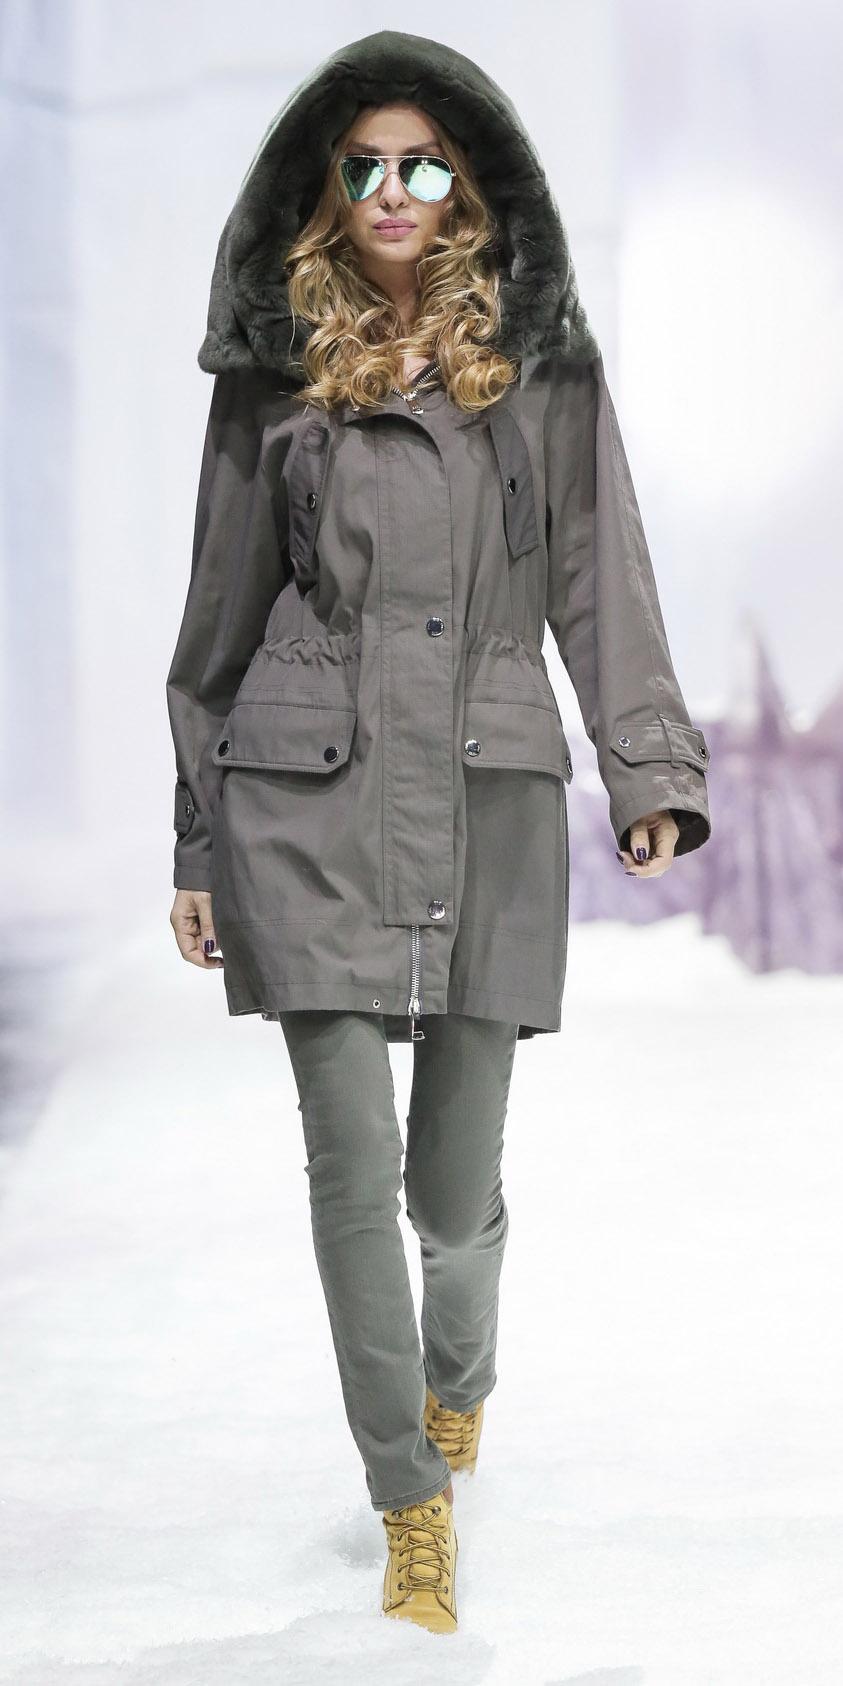 grayd-skinny-jeans-tan-shoe-booties-snow-sun-blonde-grayd-jacket-coat-parka-fall-winter-weekend.jpg